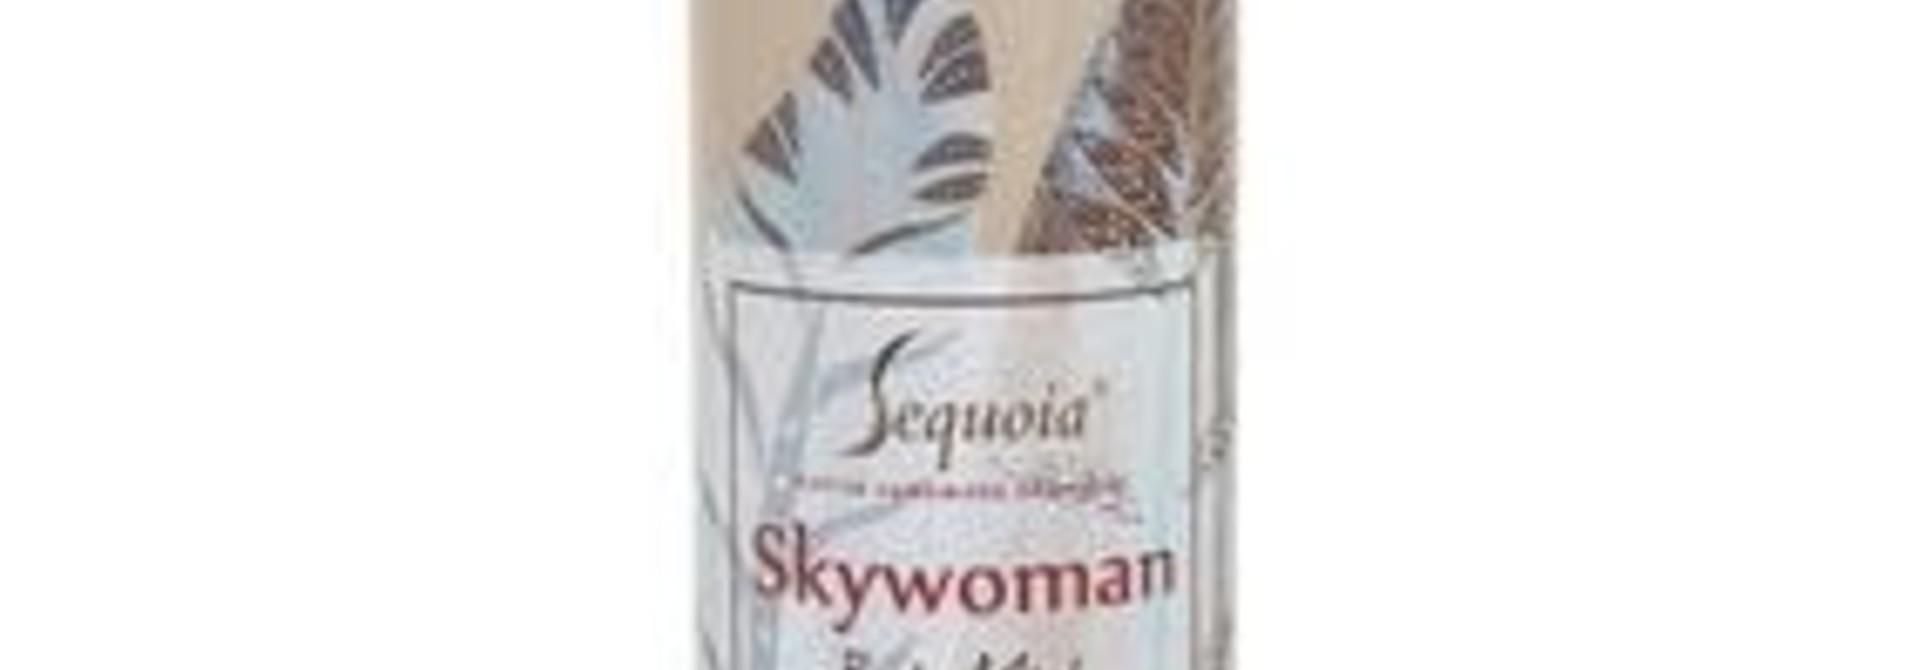 Sequoia 4oz Body Mist - Skywoman